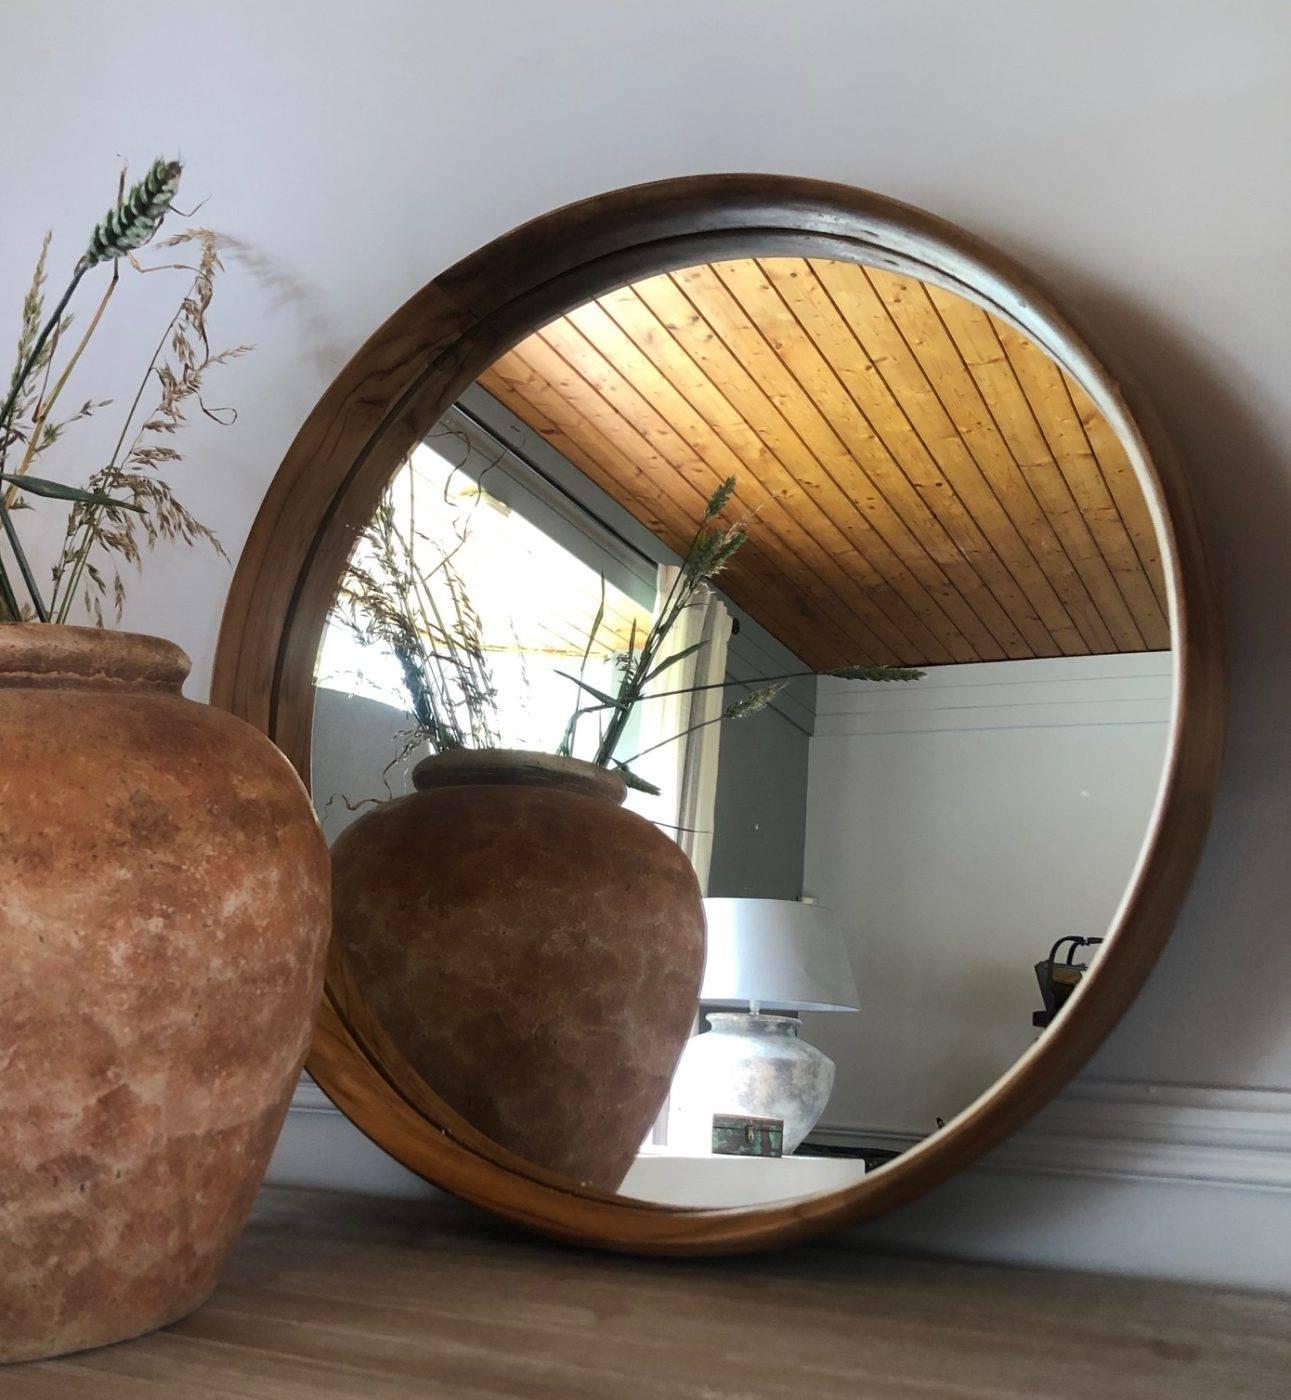 round recycled teak wood mirror on shelf